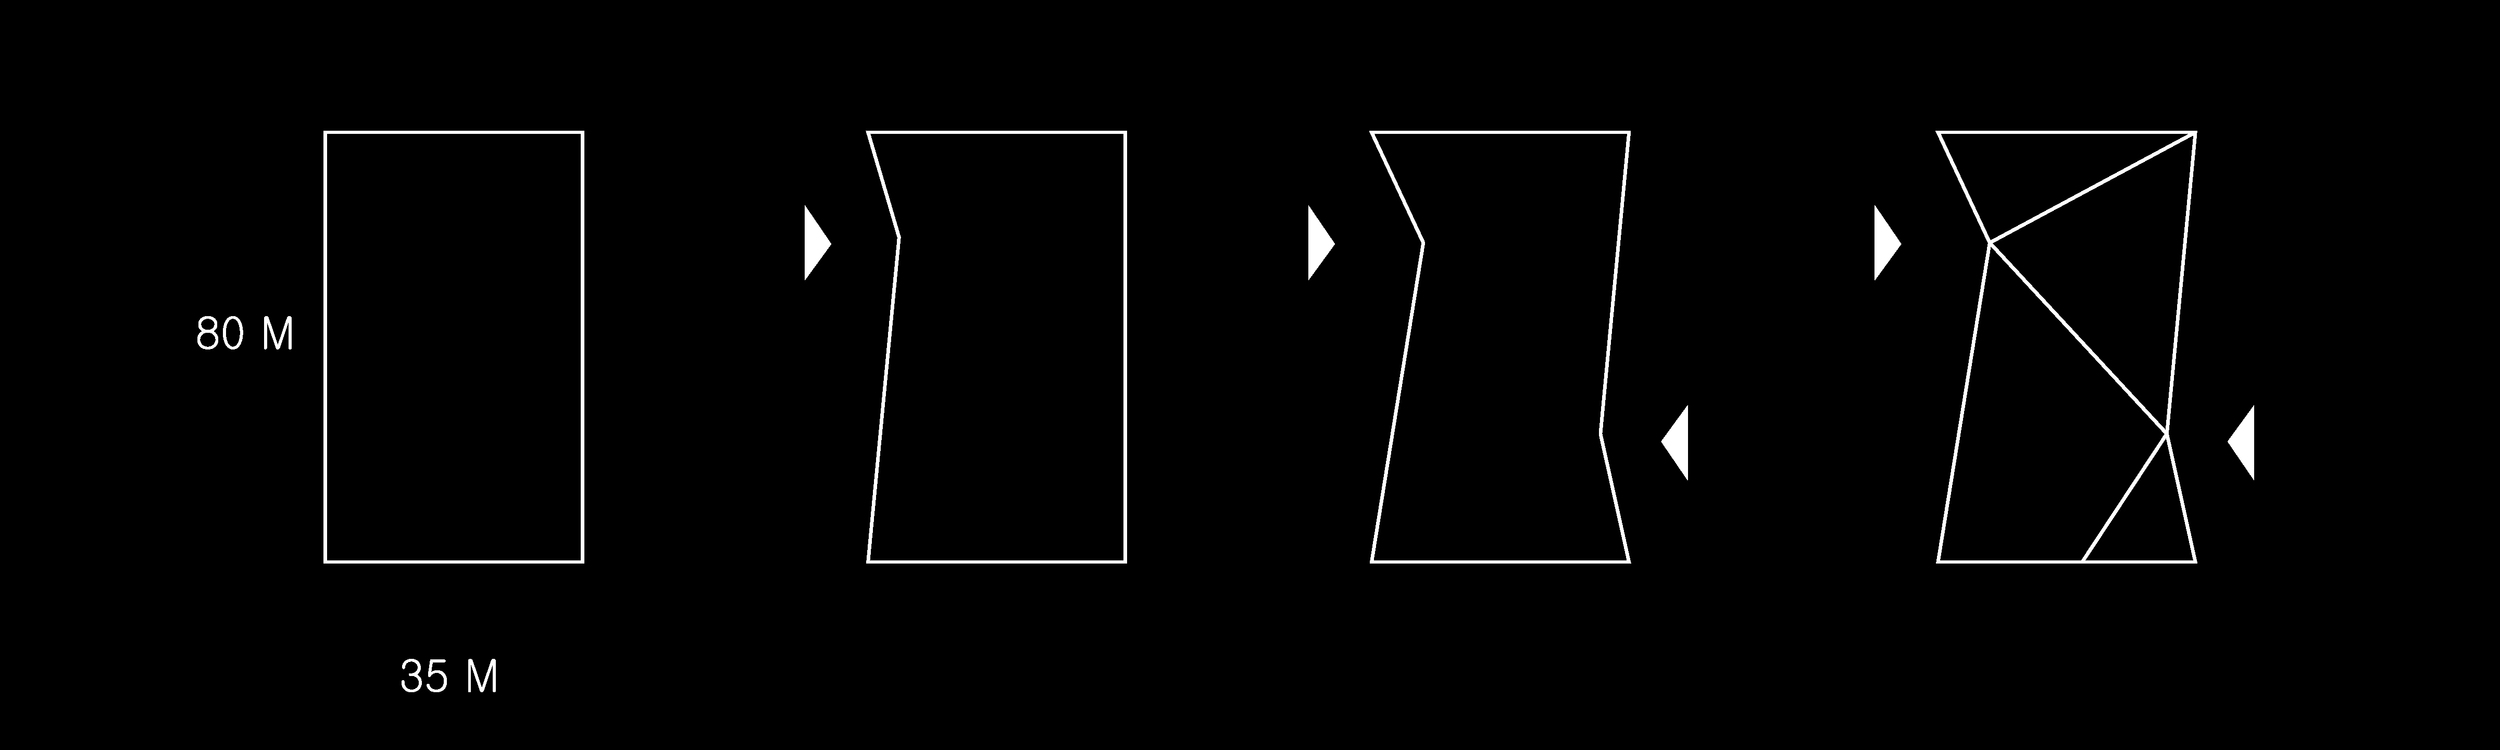 02.Binder1-3-edit.jpg